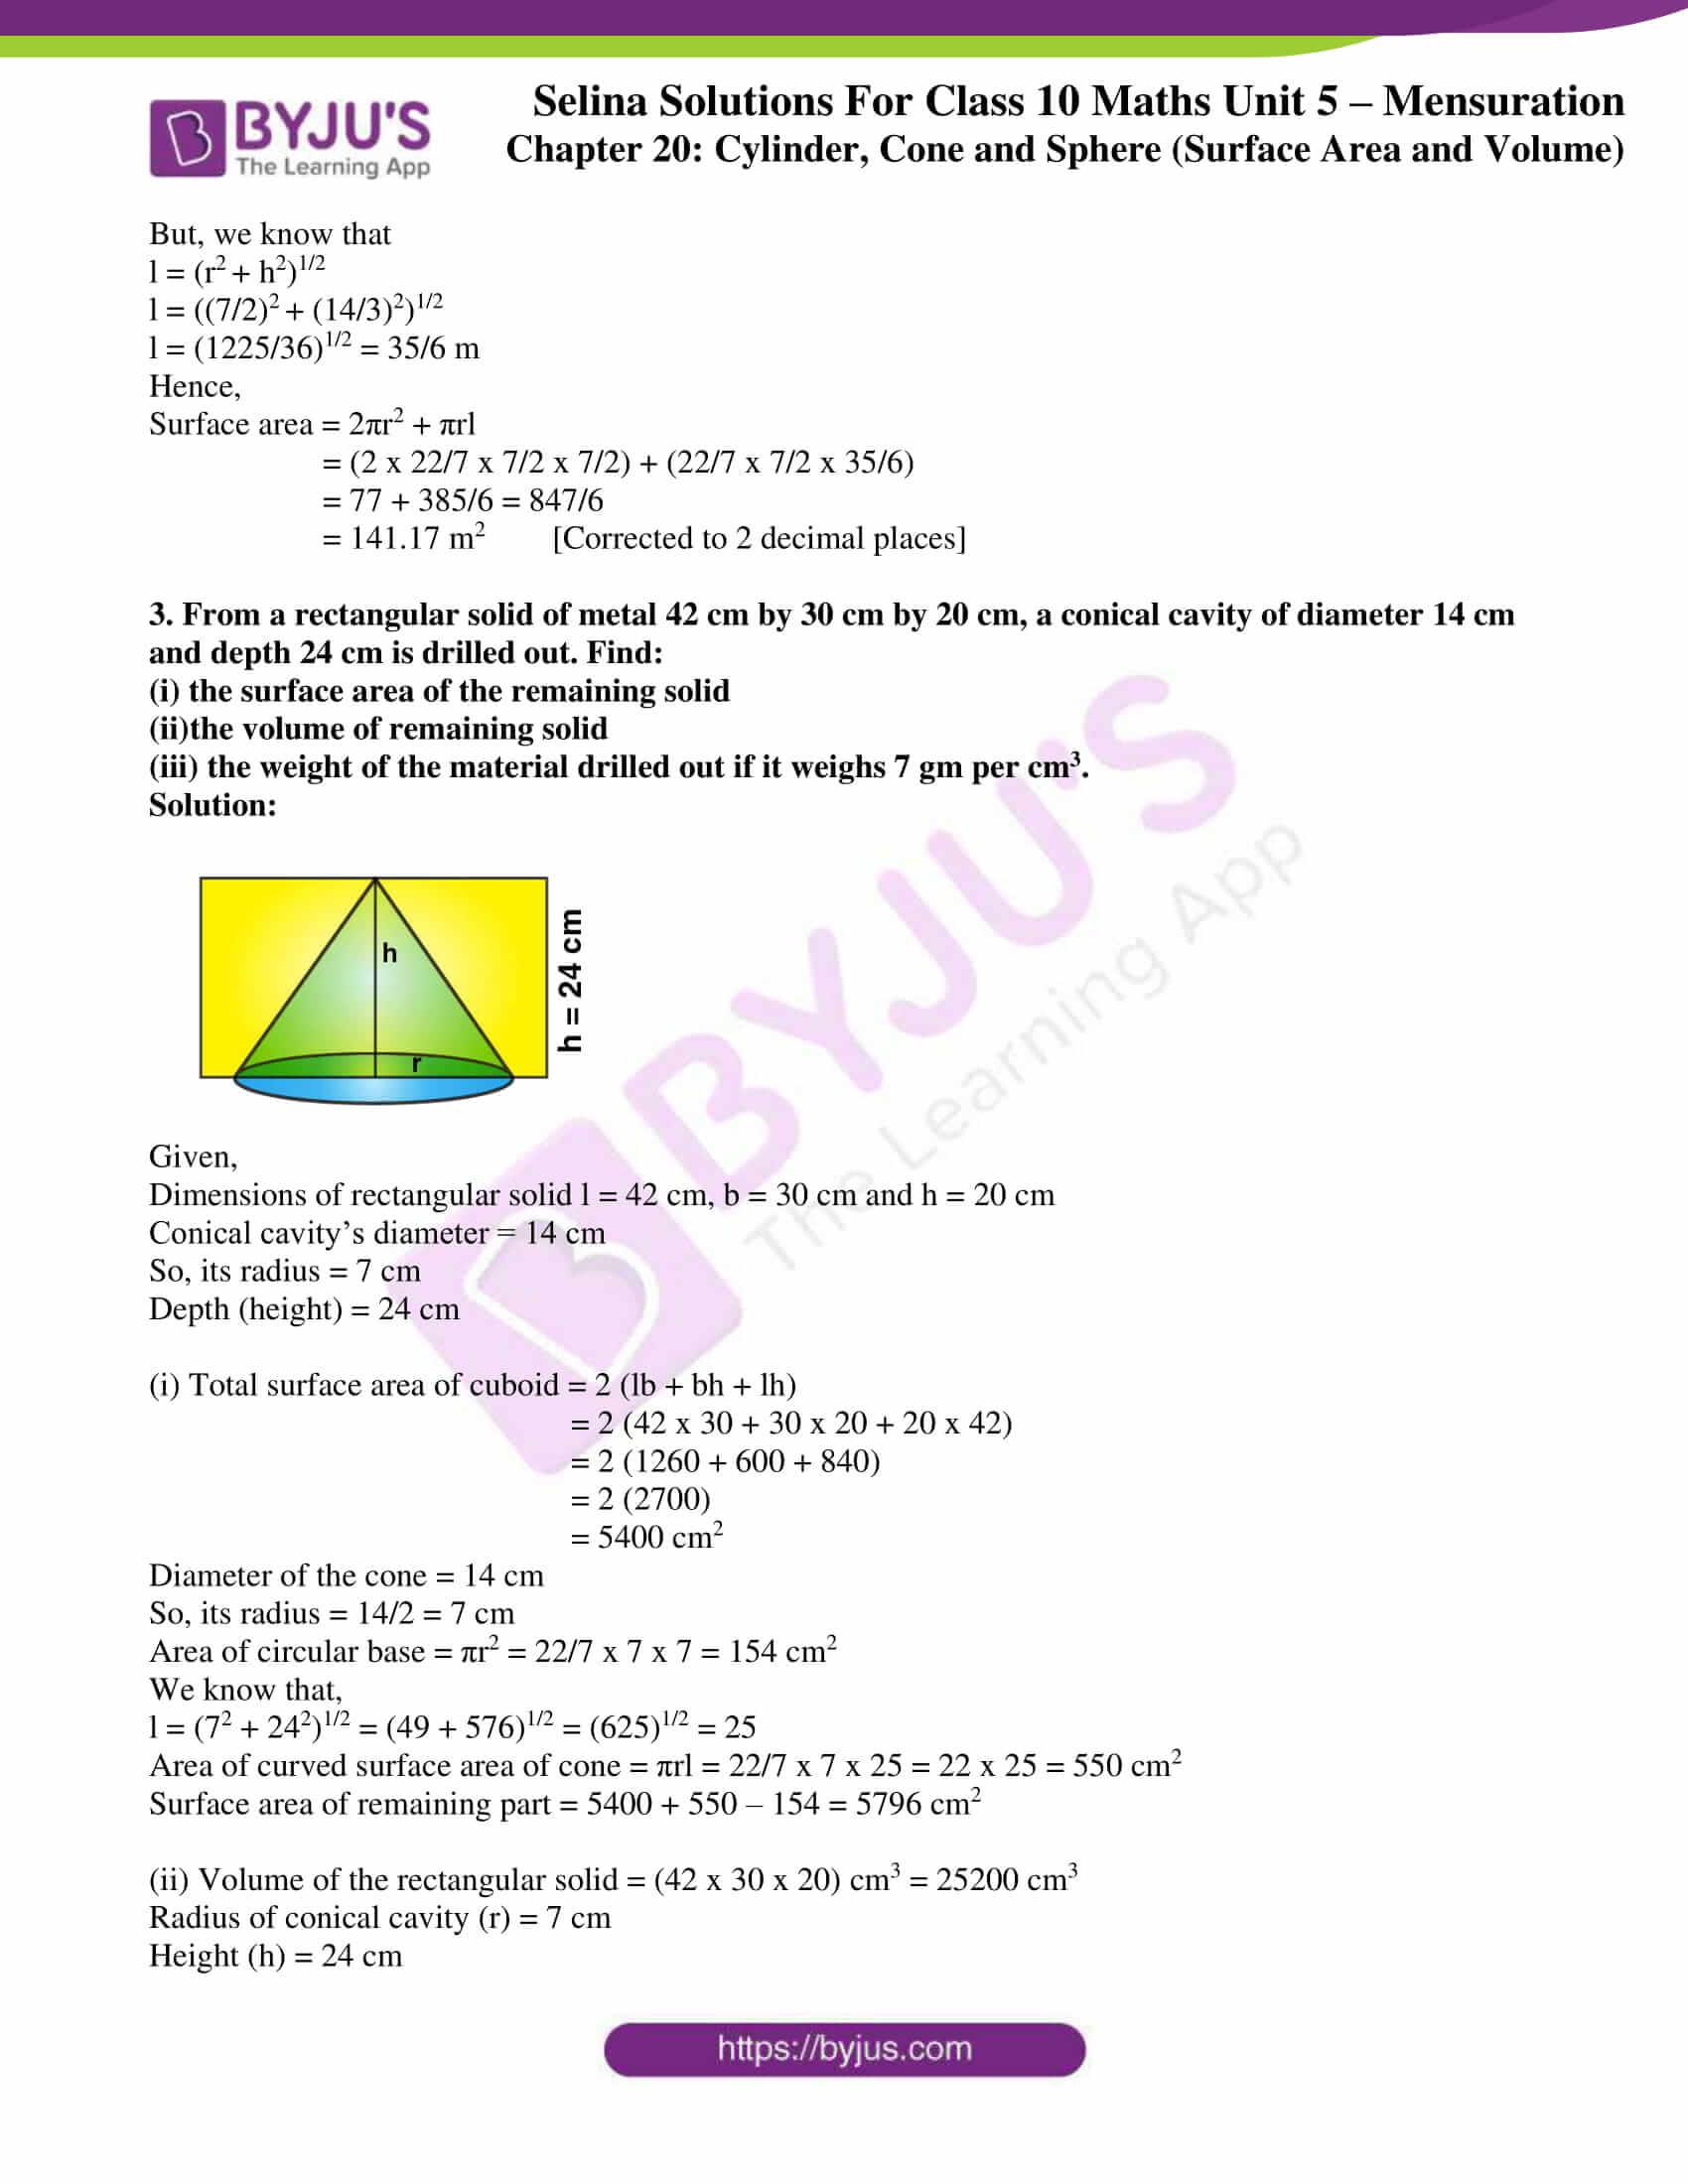 selina-sol-maths-class-10-ch-20-ex-e-2